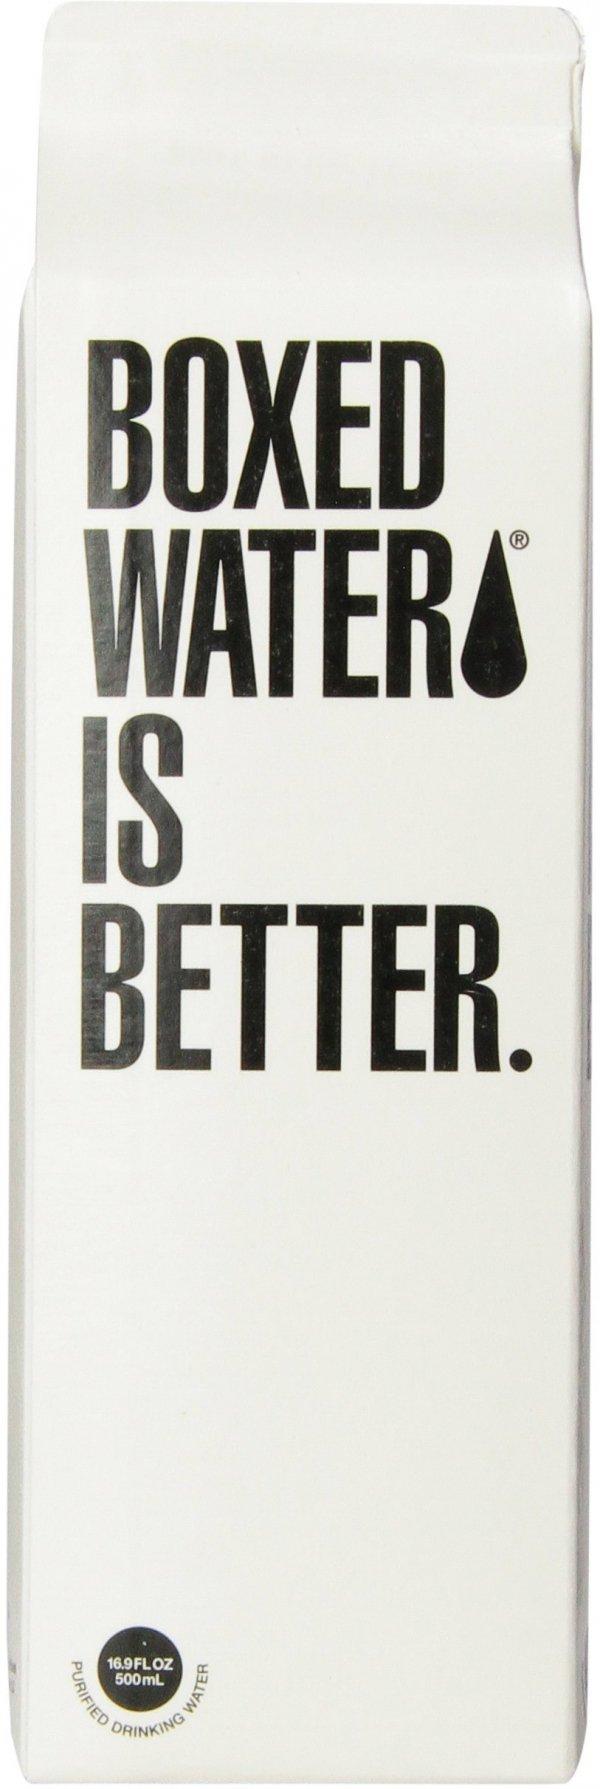 Boxed Water, distilled beverage, sland, WATER,